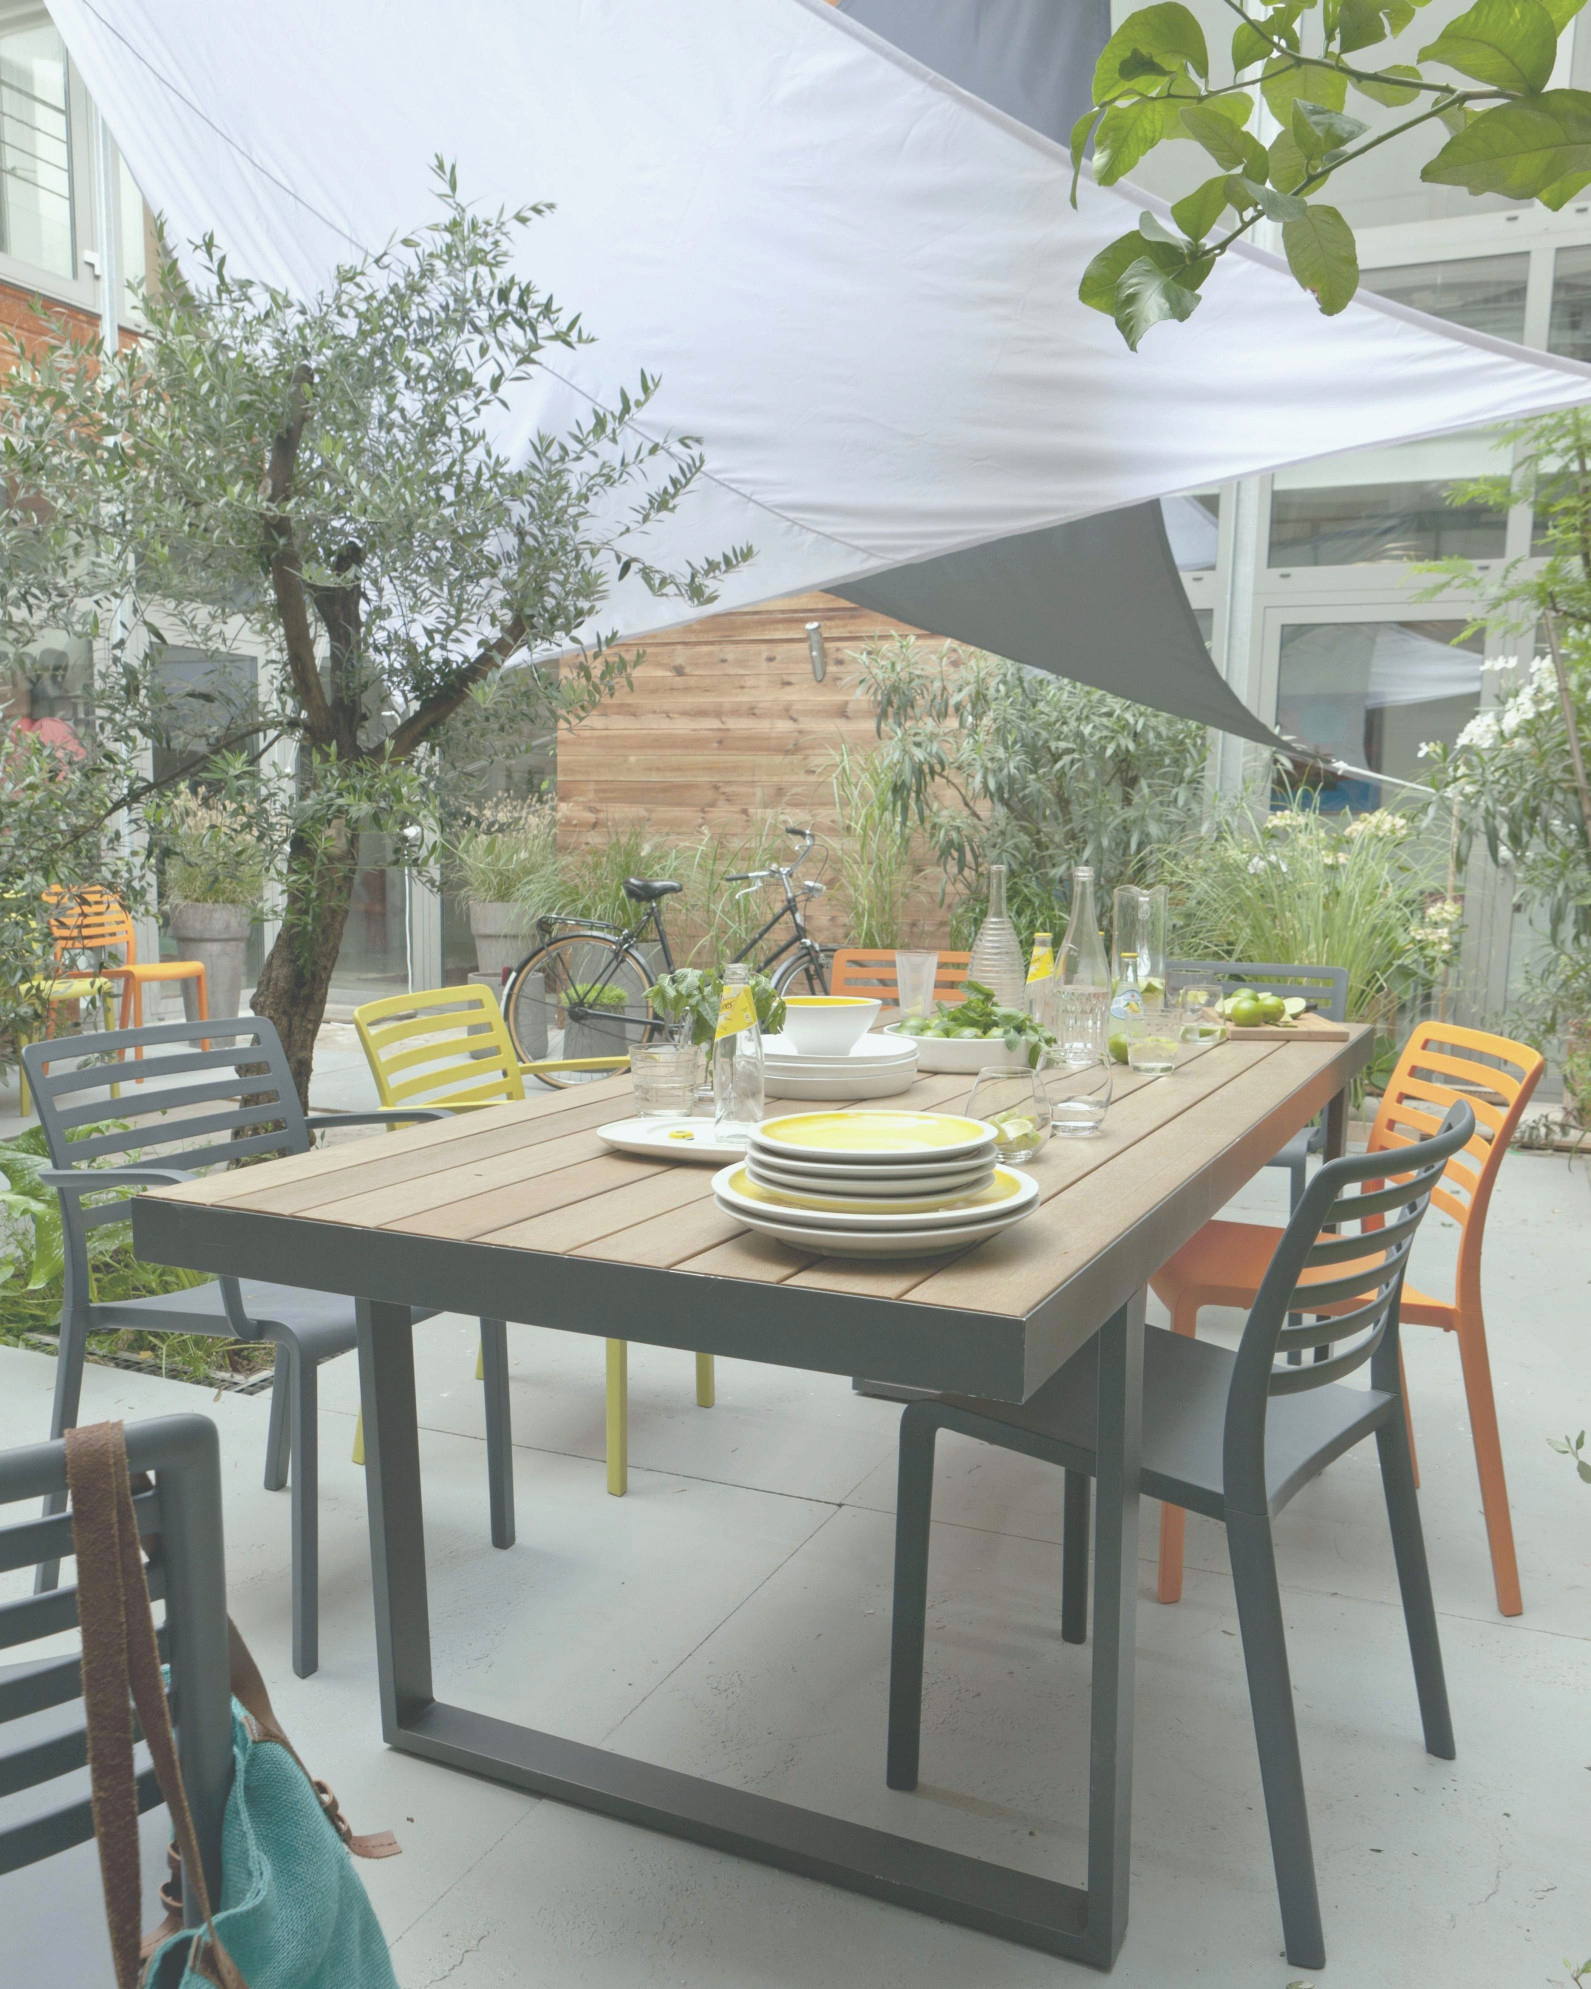 Luxe Vente Privee Chaise - Luckytroll concernant Vente Privee Jardin